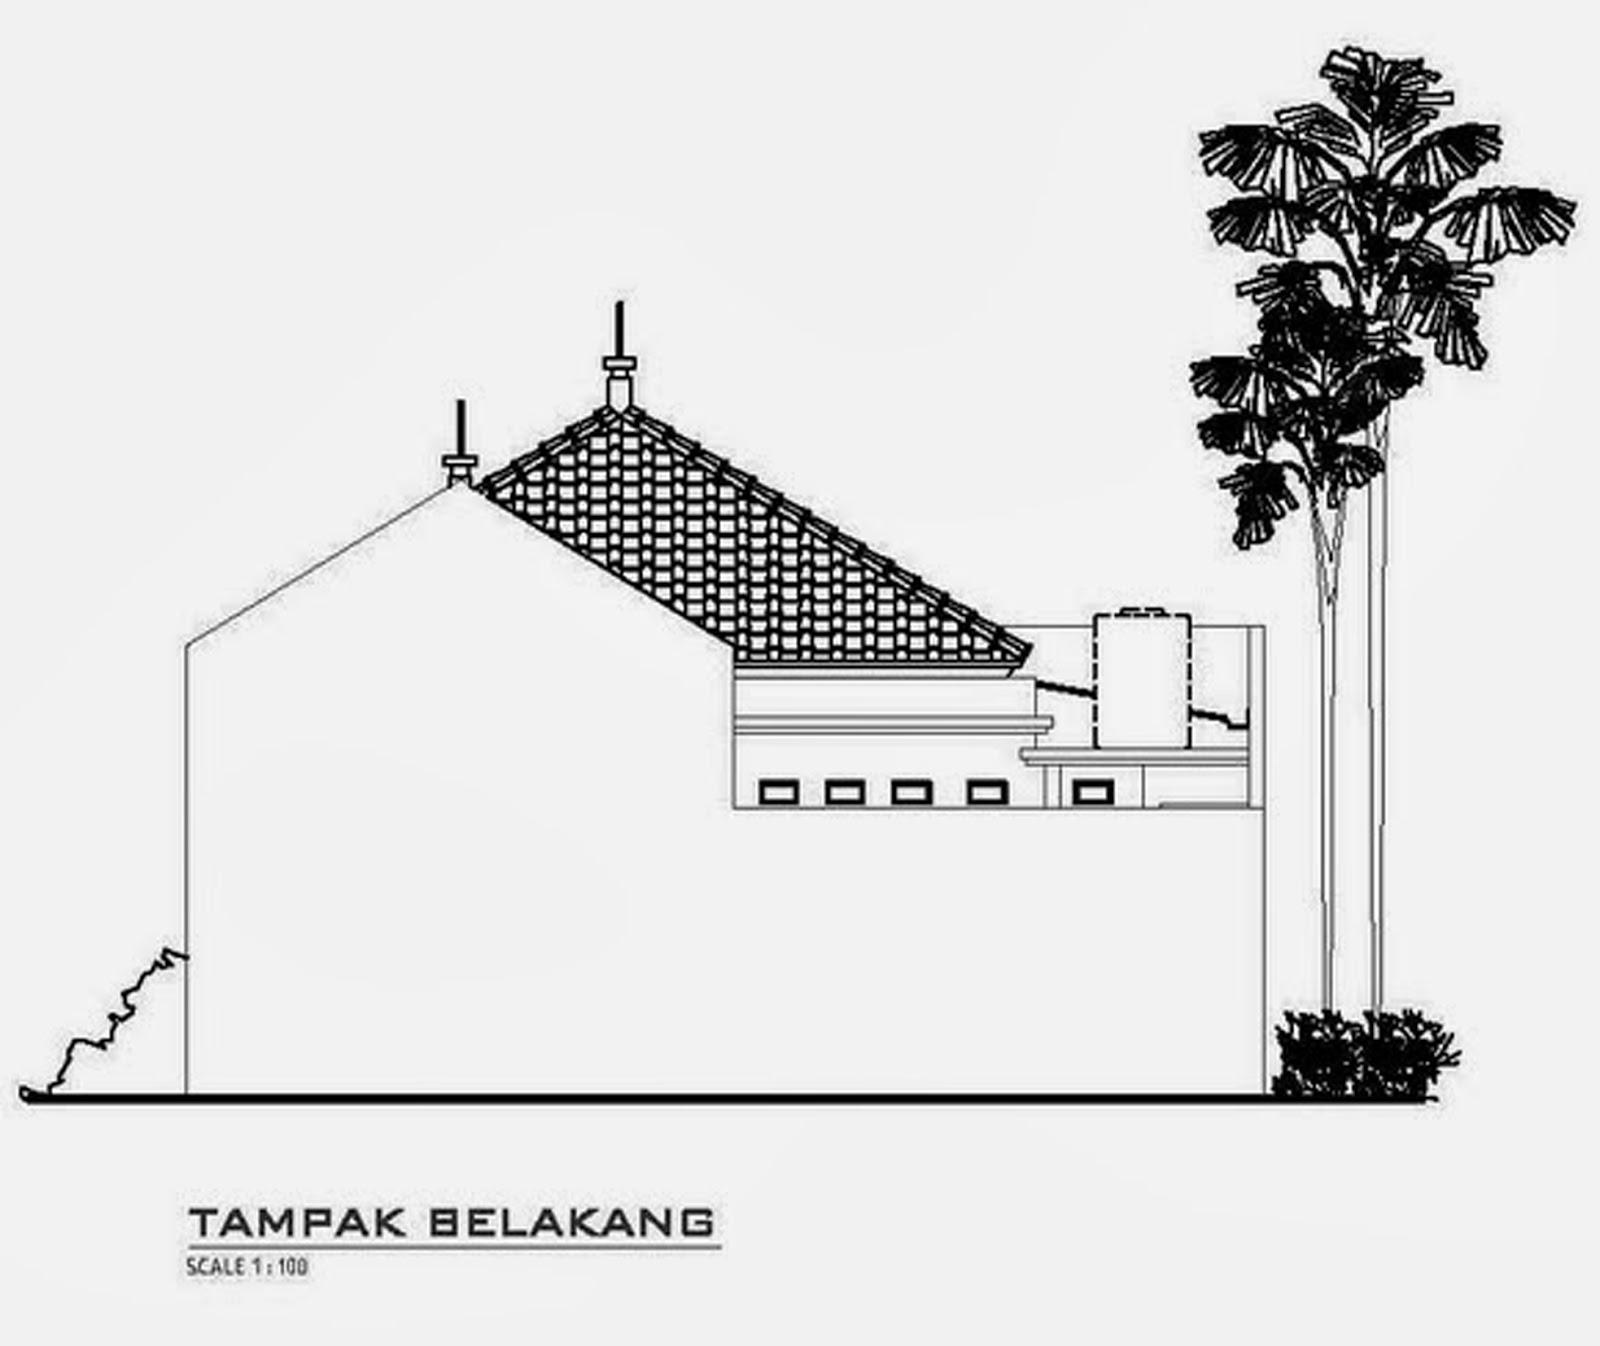 Gambar Rumah 1 Lantai N&ak Belakang